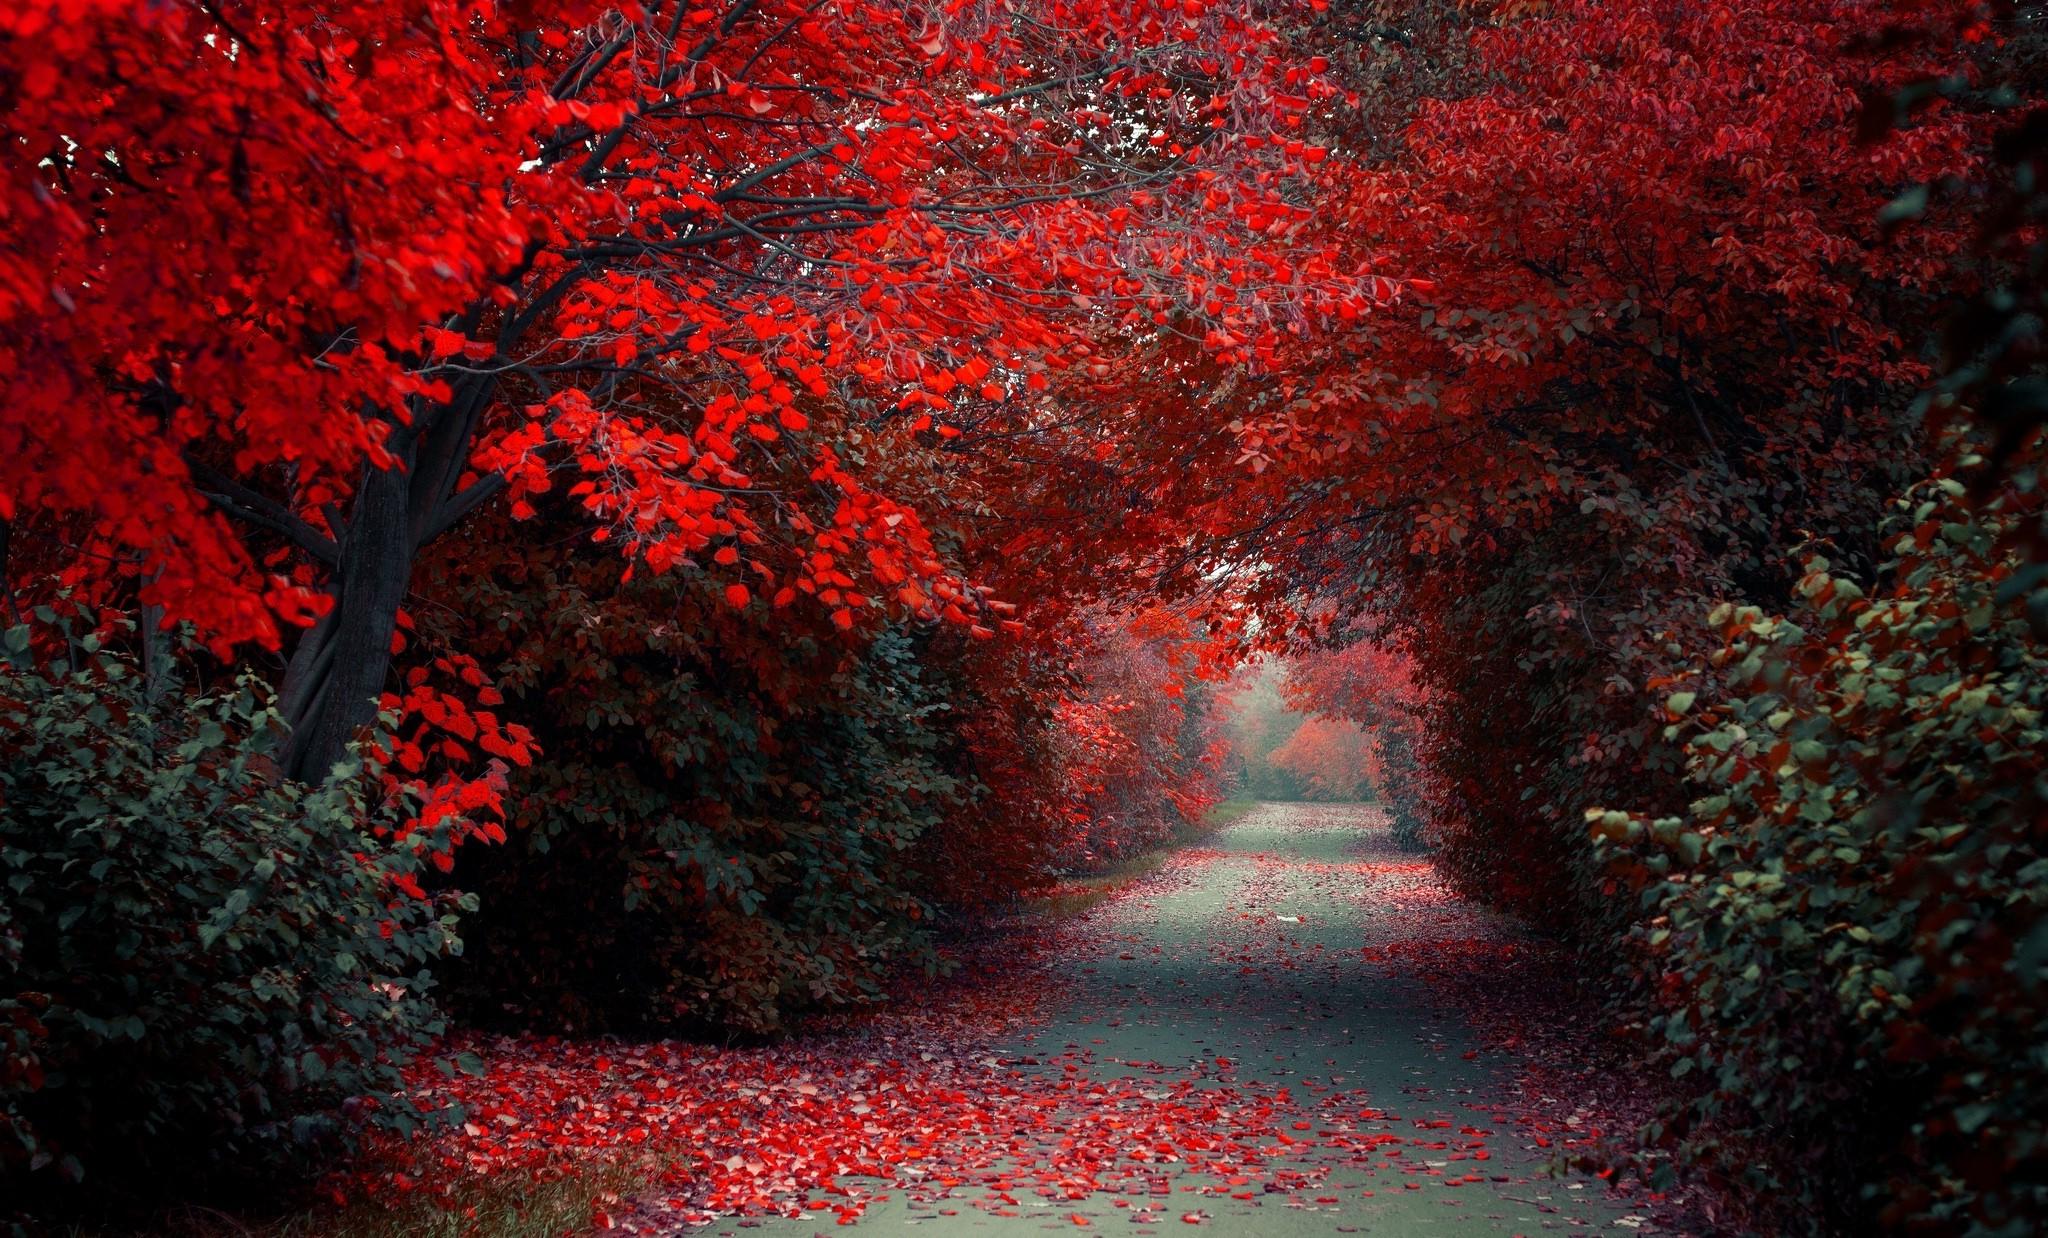 red nature wallpaper,tree,red,nature,natural landscape,leaf